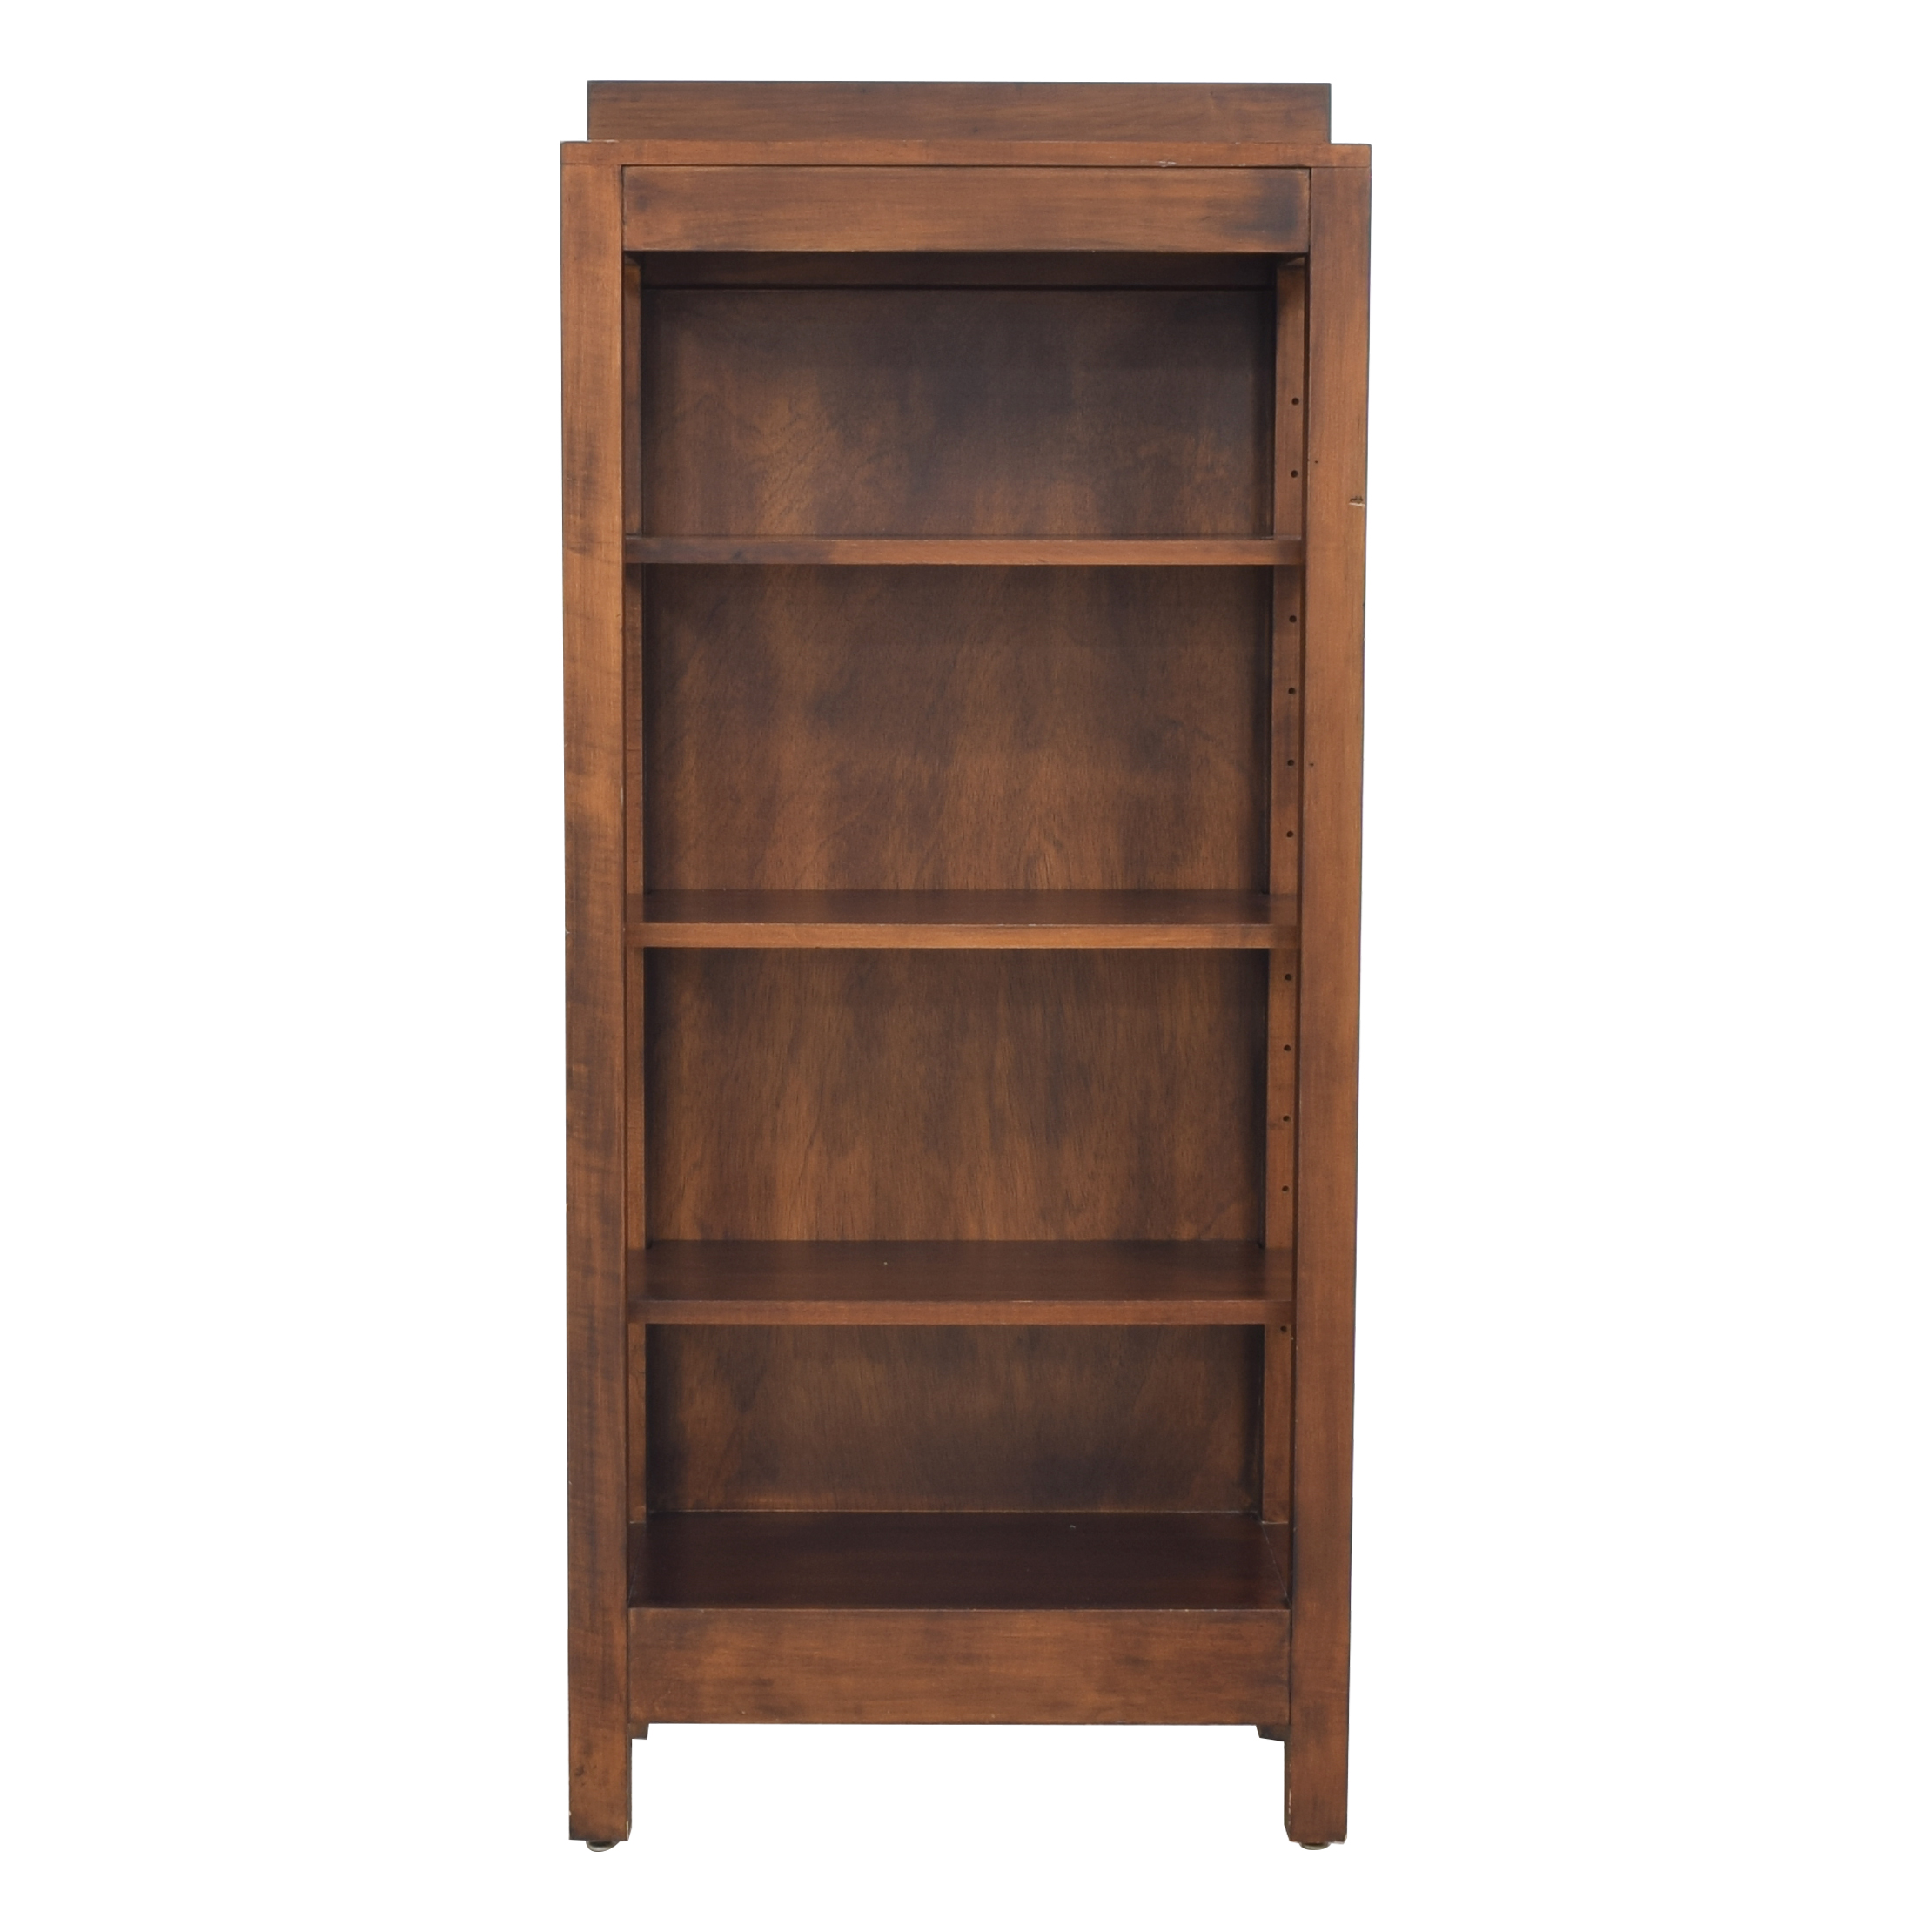 buy Romweber by Jim Peed Modern Bookcase Romweber Bookcases & Shelving